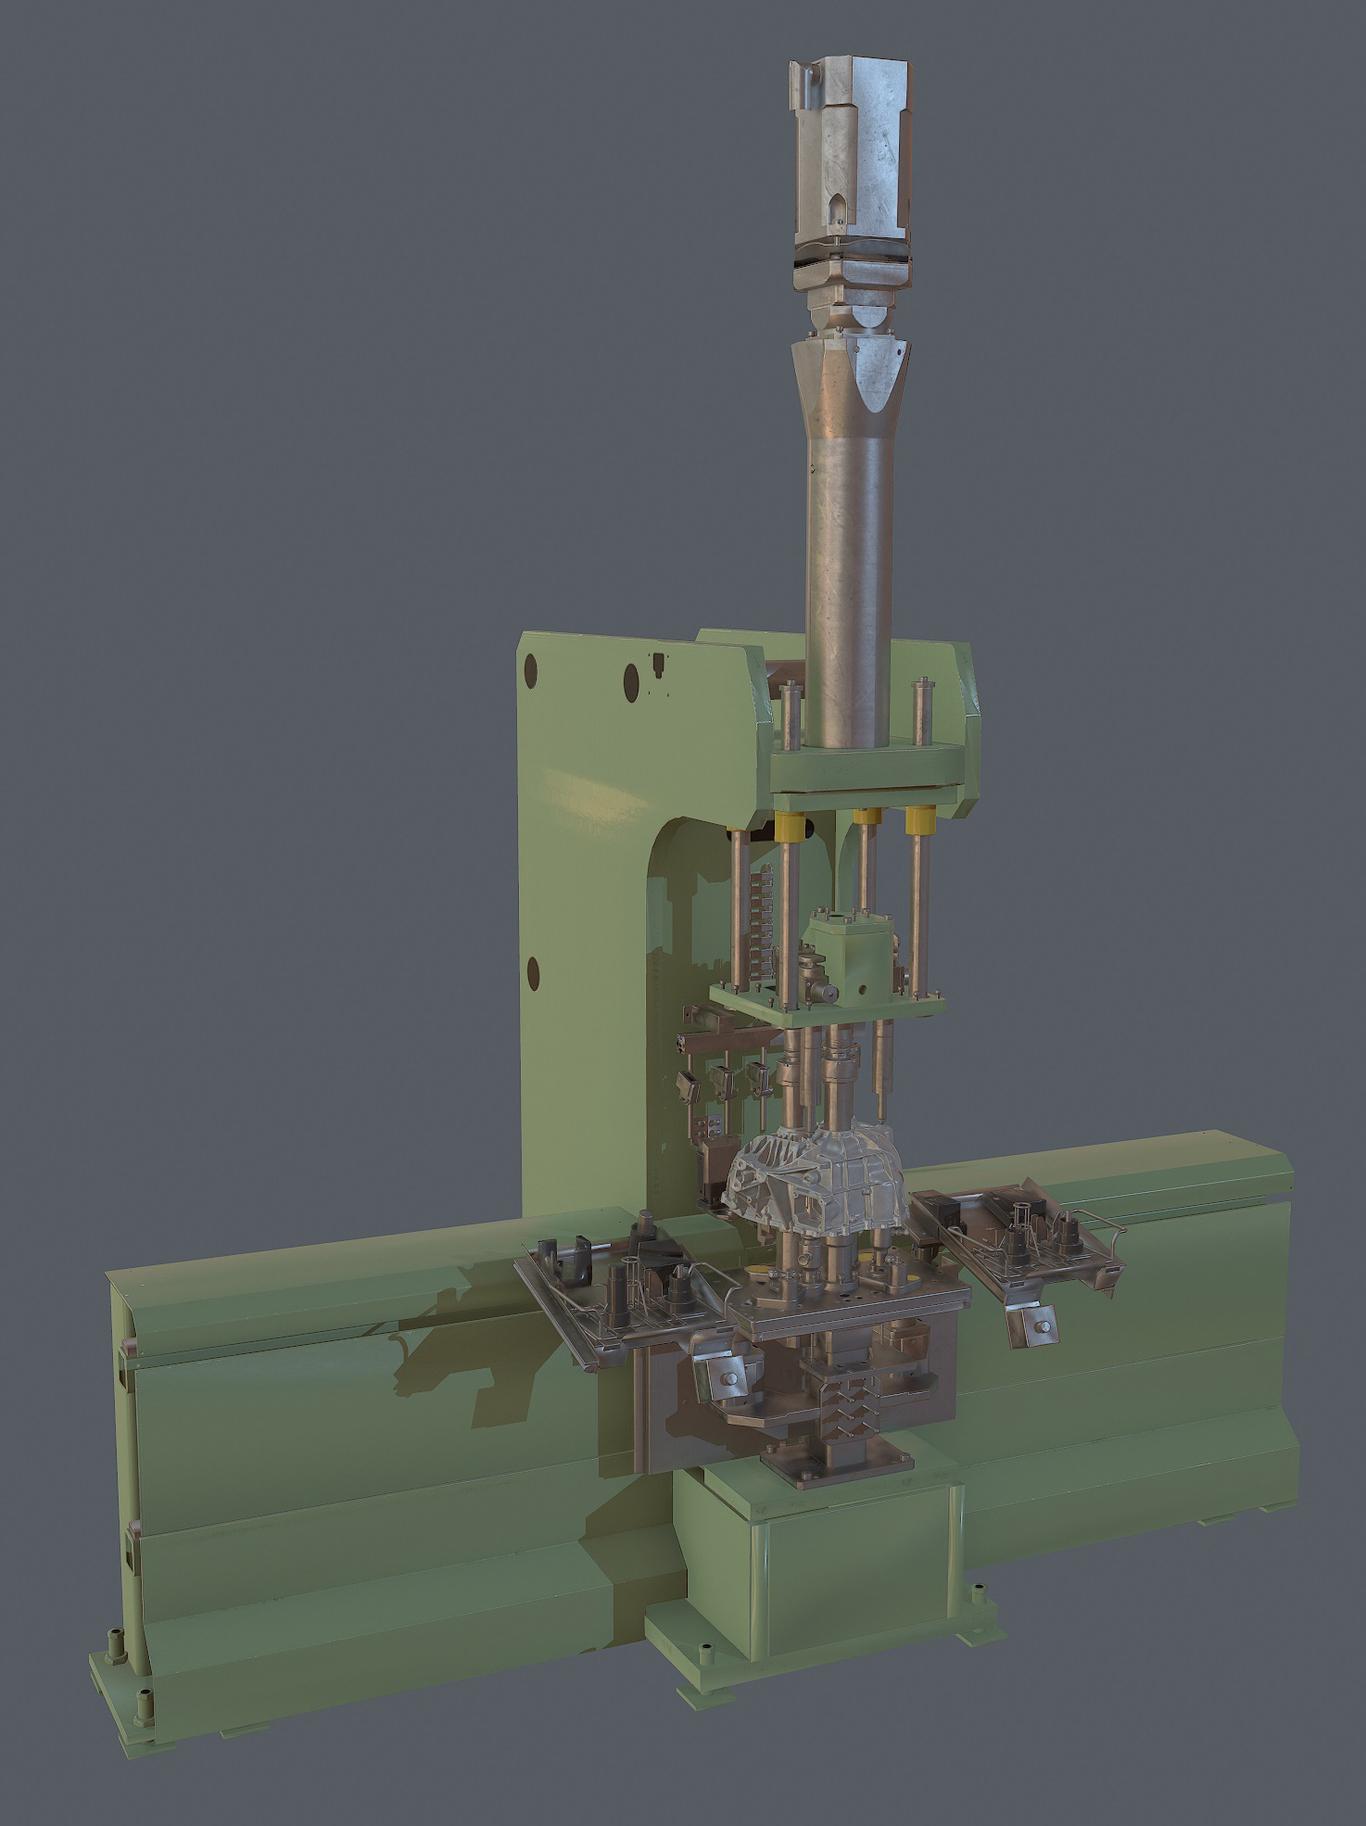 Gabytiro industrial assembly  1 66c26687 78tu